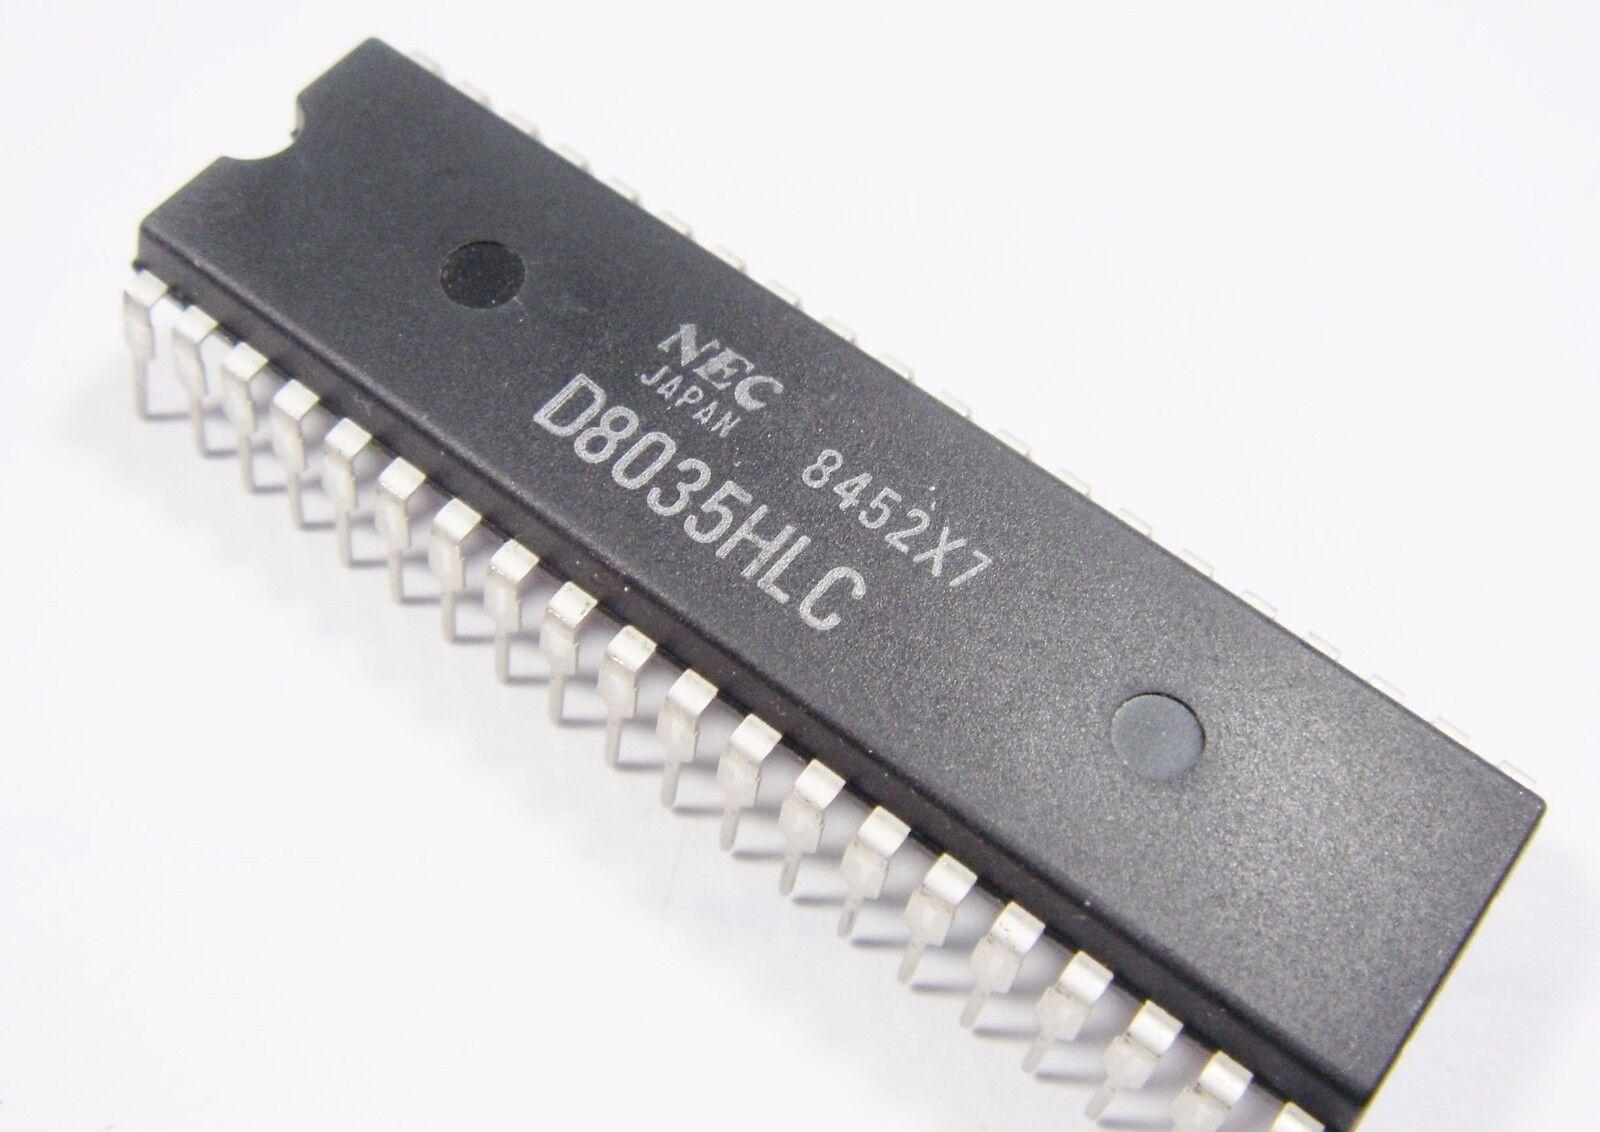 6 x HEF4051BP CD4051BE 8-channel Multiplexeur analogique 4051 PHILIPS DIP-16 £ 0.50ea